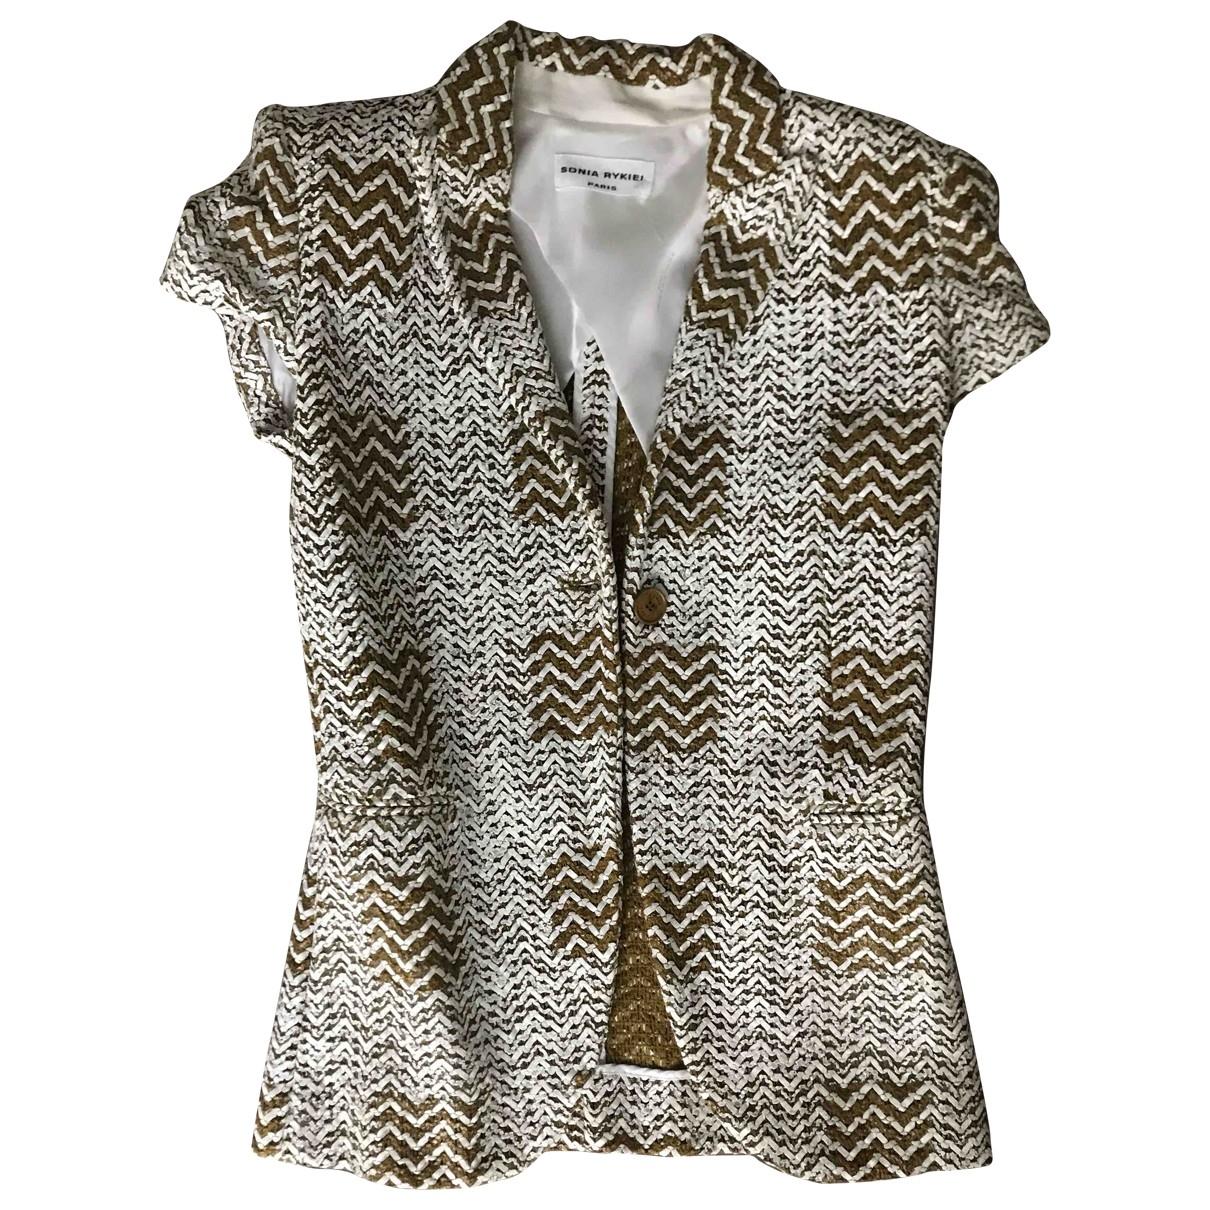 Sonia Rykiel - Veste   pour femme en coton - multicolore